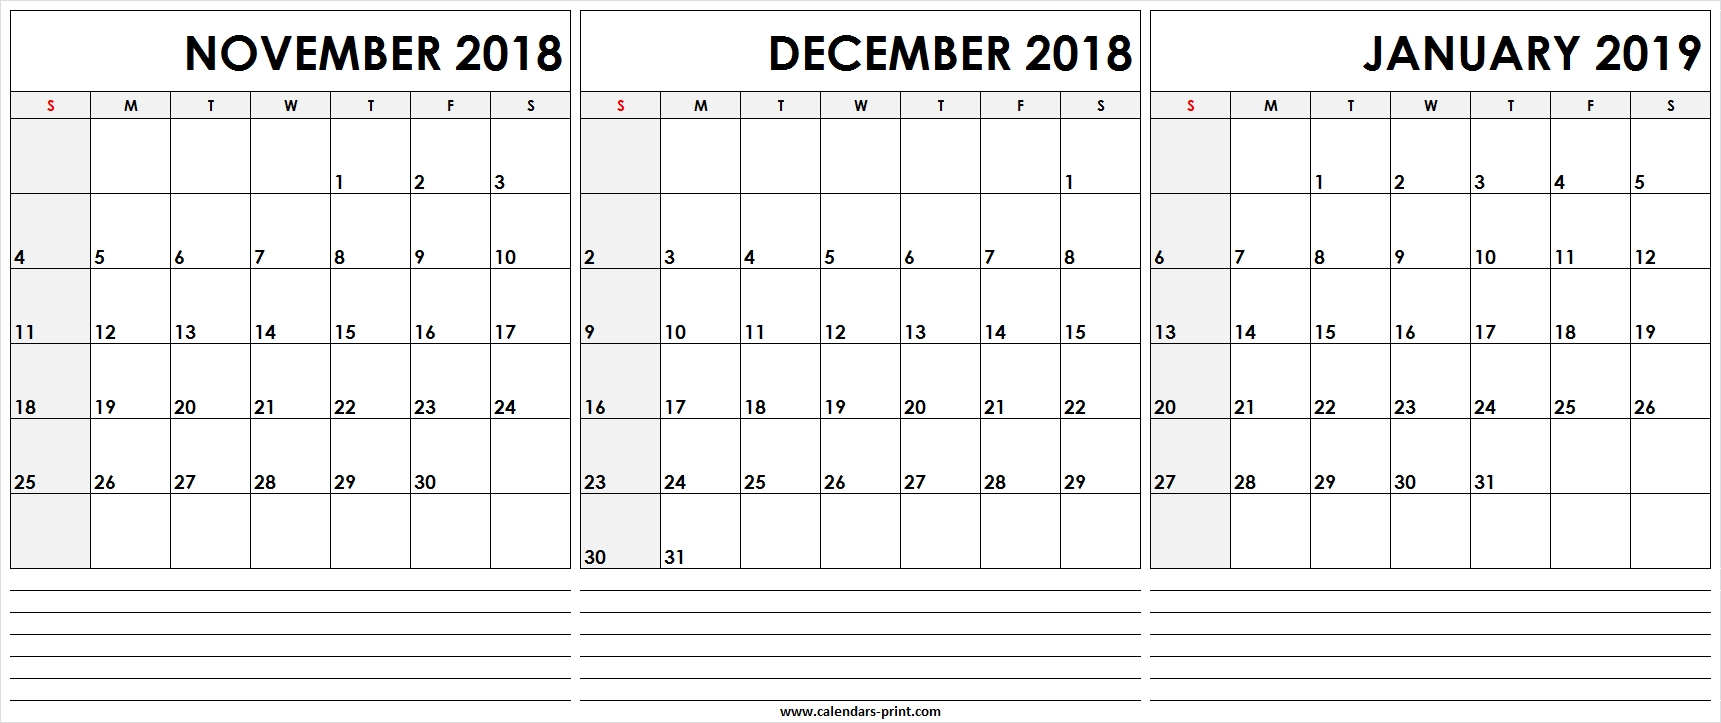 Print Calendar November December January | Ten Free